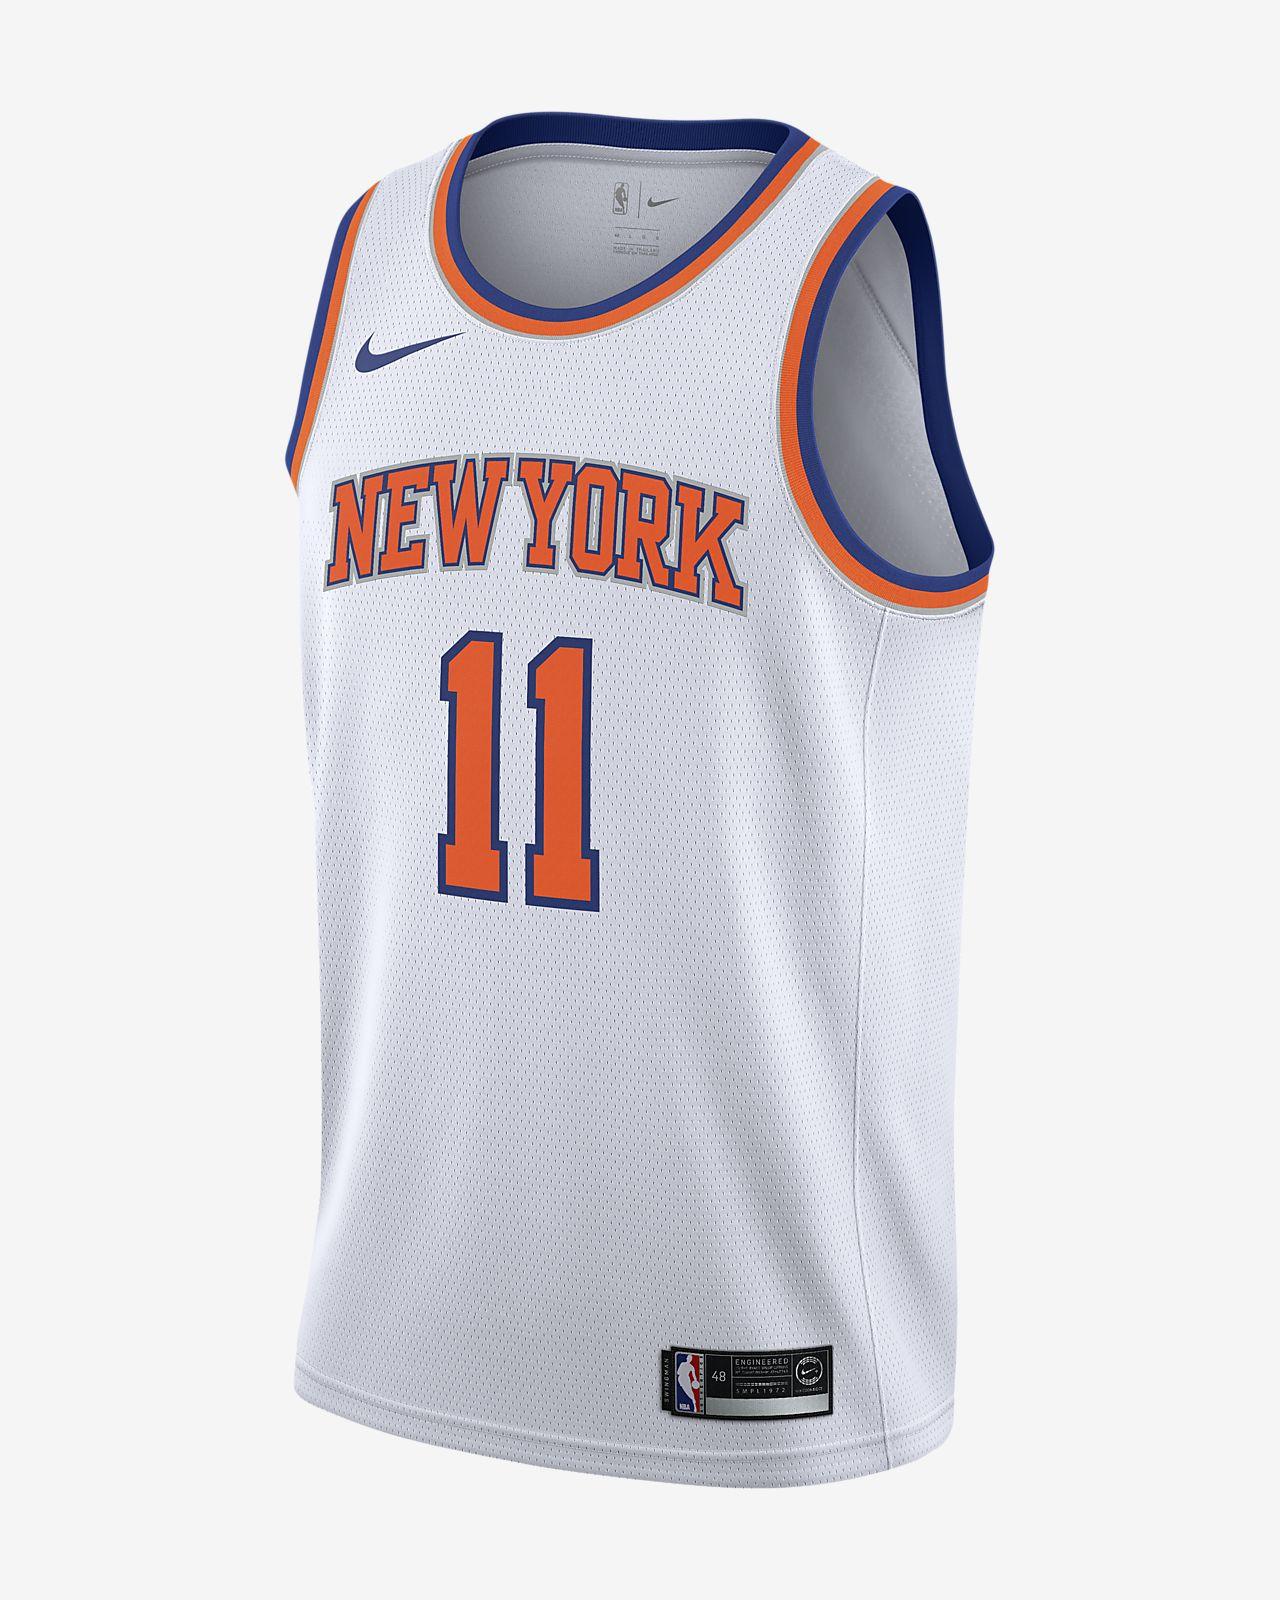 sale retailer 1b08e 88eca ... Maillot connecté Nike NBA Frank Ntilikina Association Edition Swingman  (New York Knicks) pour Homme